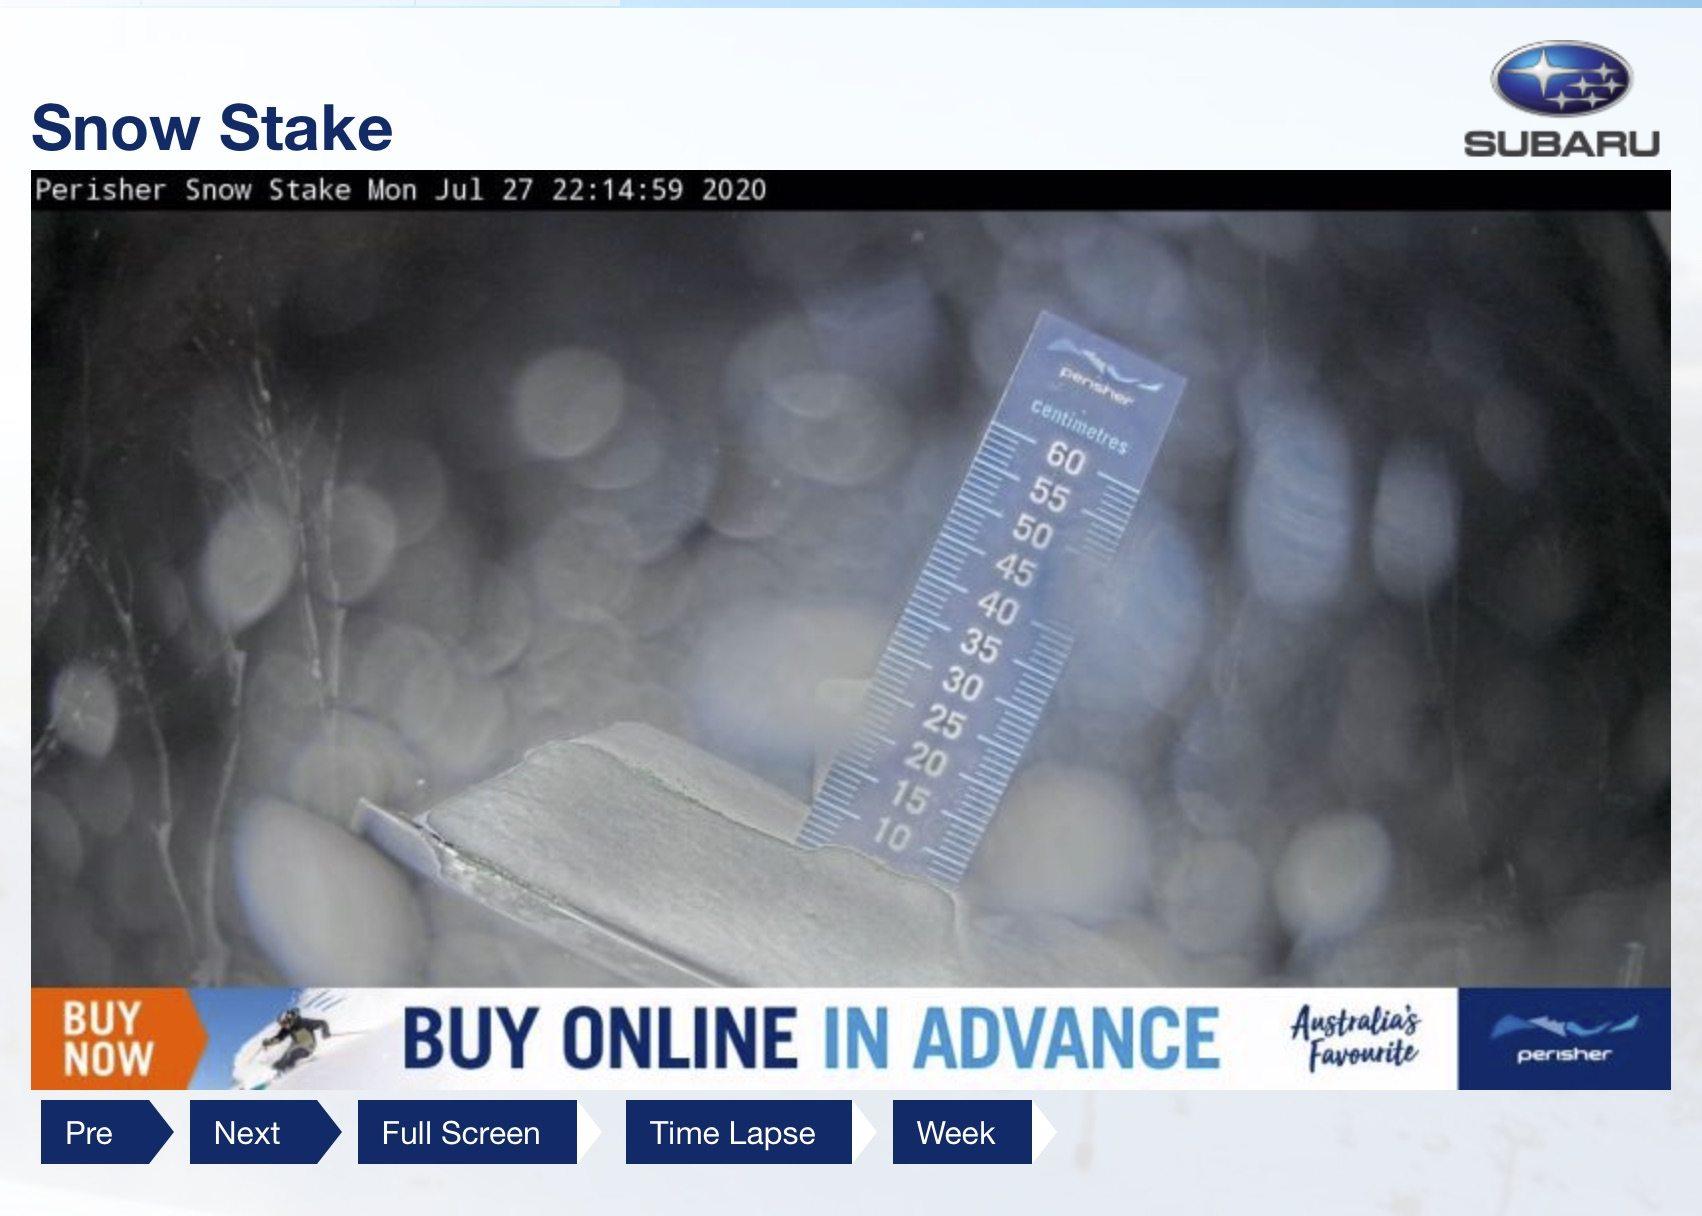 Screen Shot 2020-07-27 at 10.32.07 pm.jpg